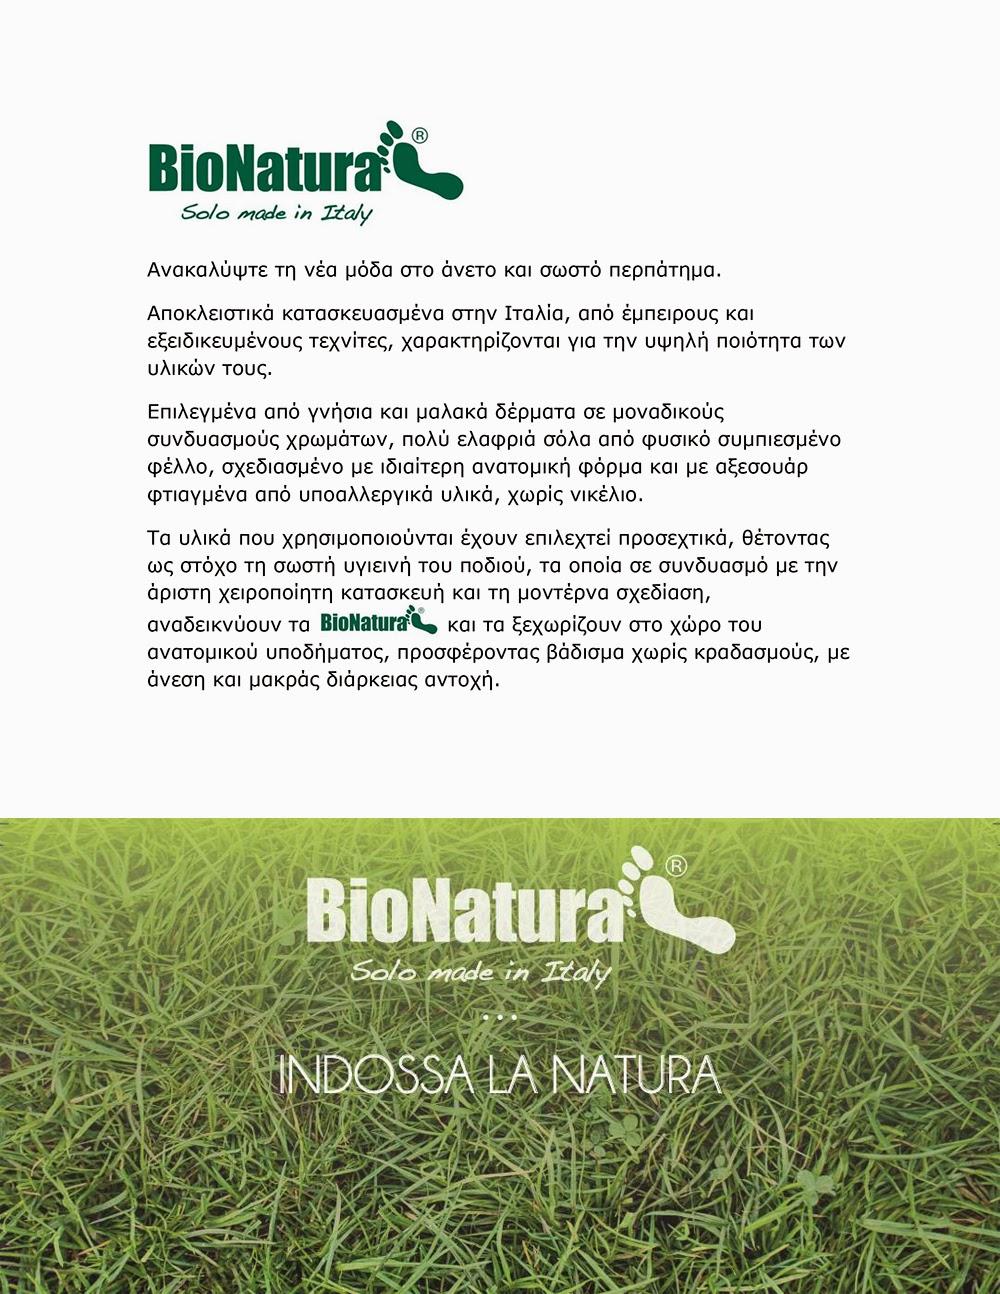 BioNatura ● Solo made in Italy